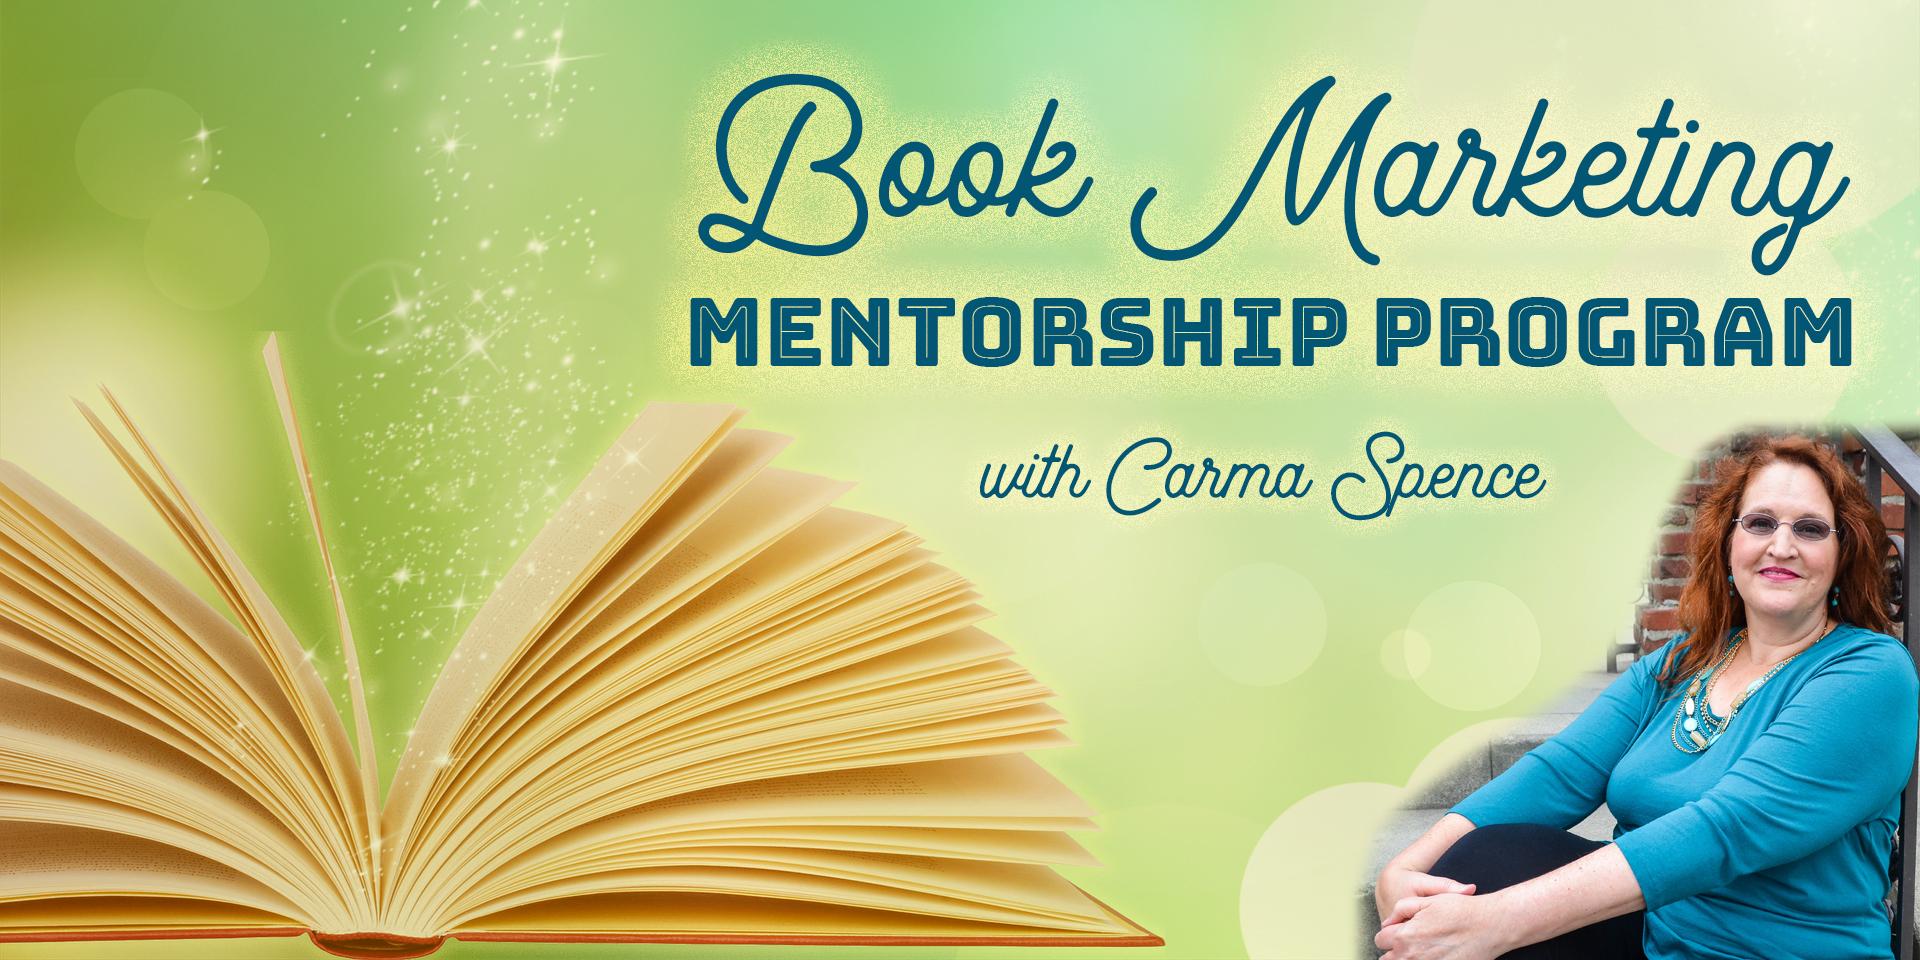 Book Marketing Mentorship Program